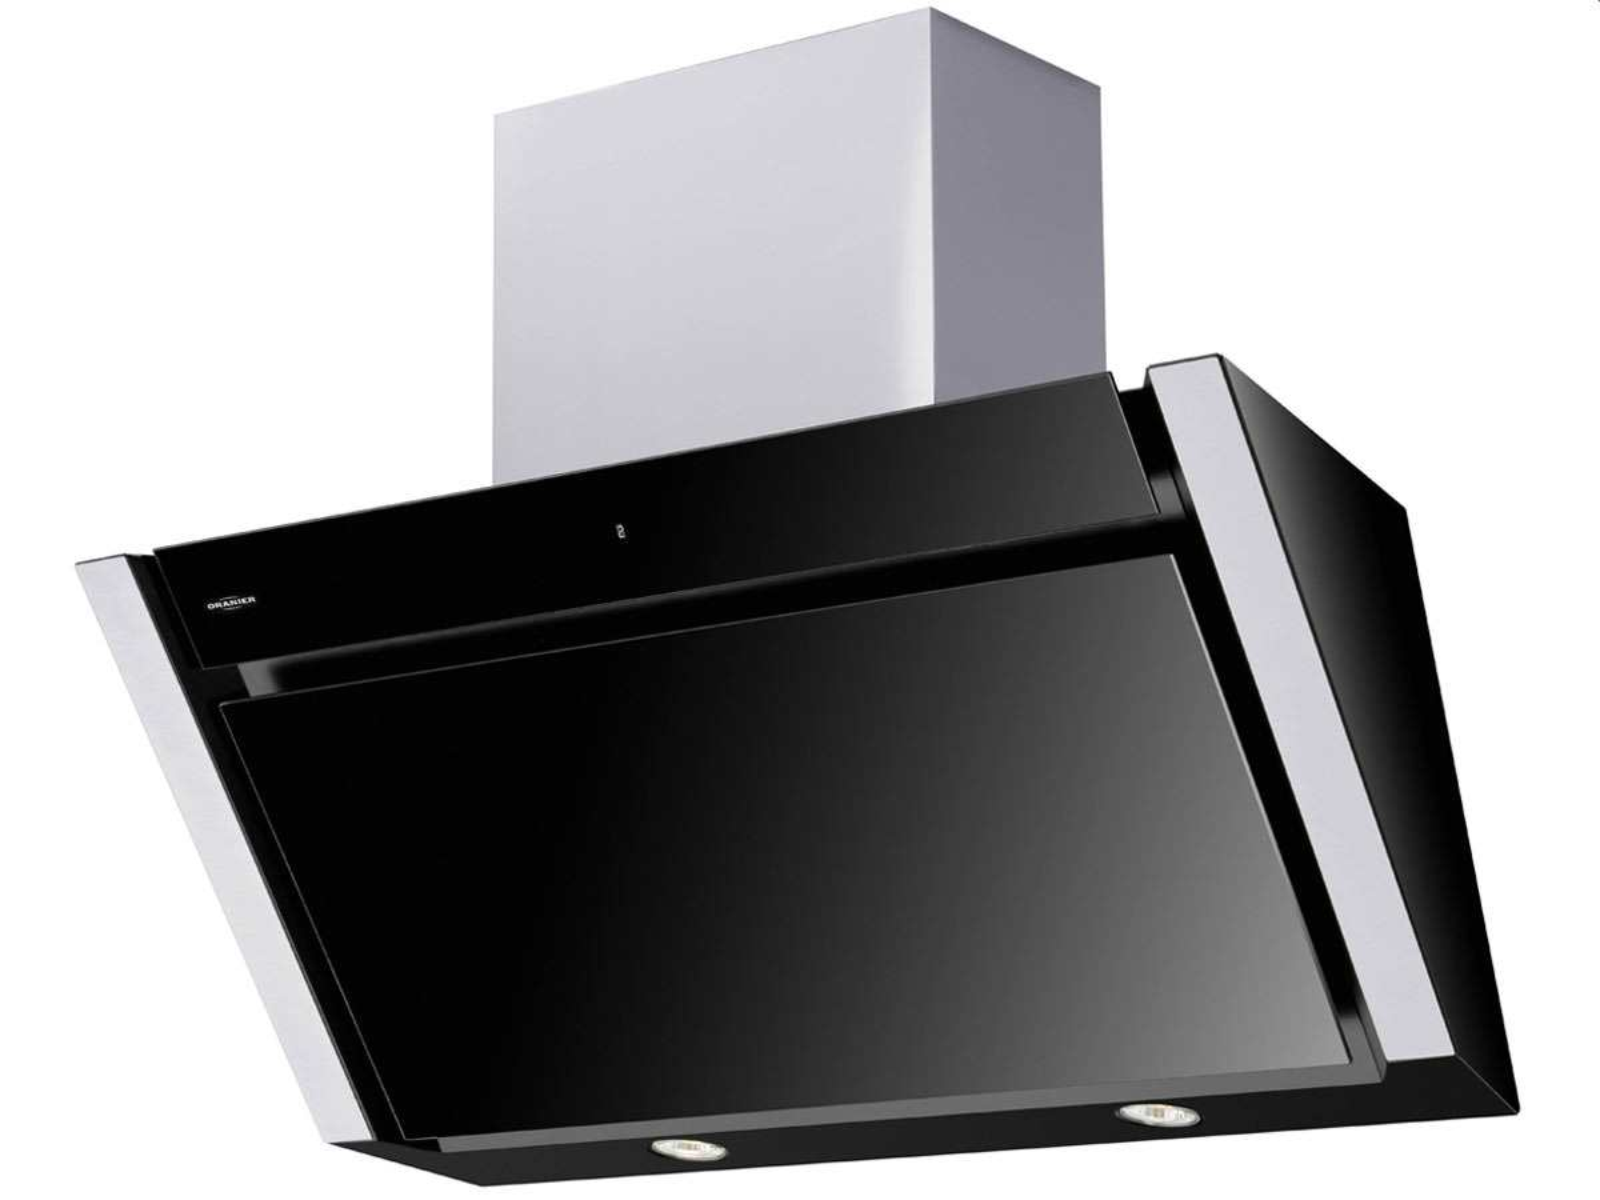 oranier meba 90 s 8702 92 kopffreihaube edelstahl schwarz. Black Bedroom Furniture Sets. Home Design Ideas